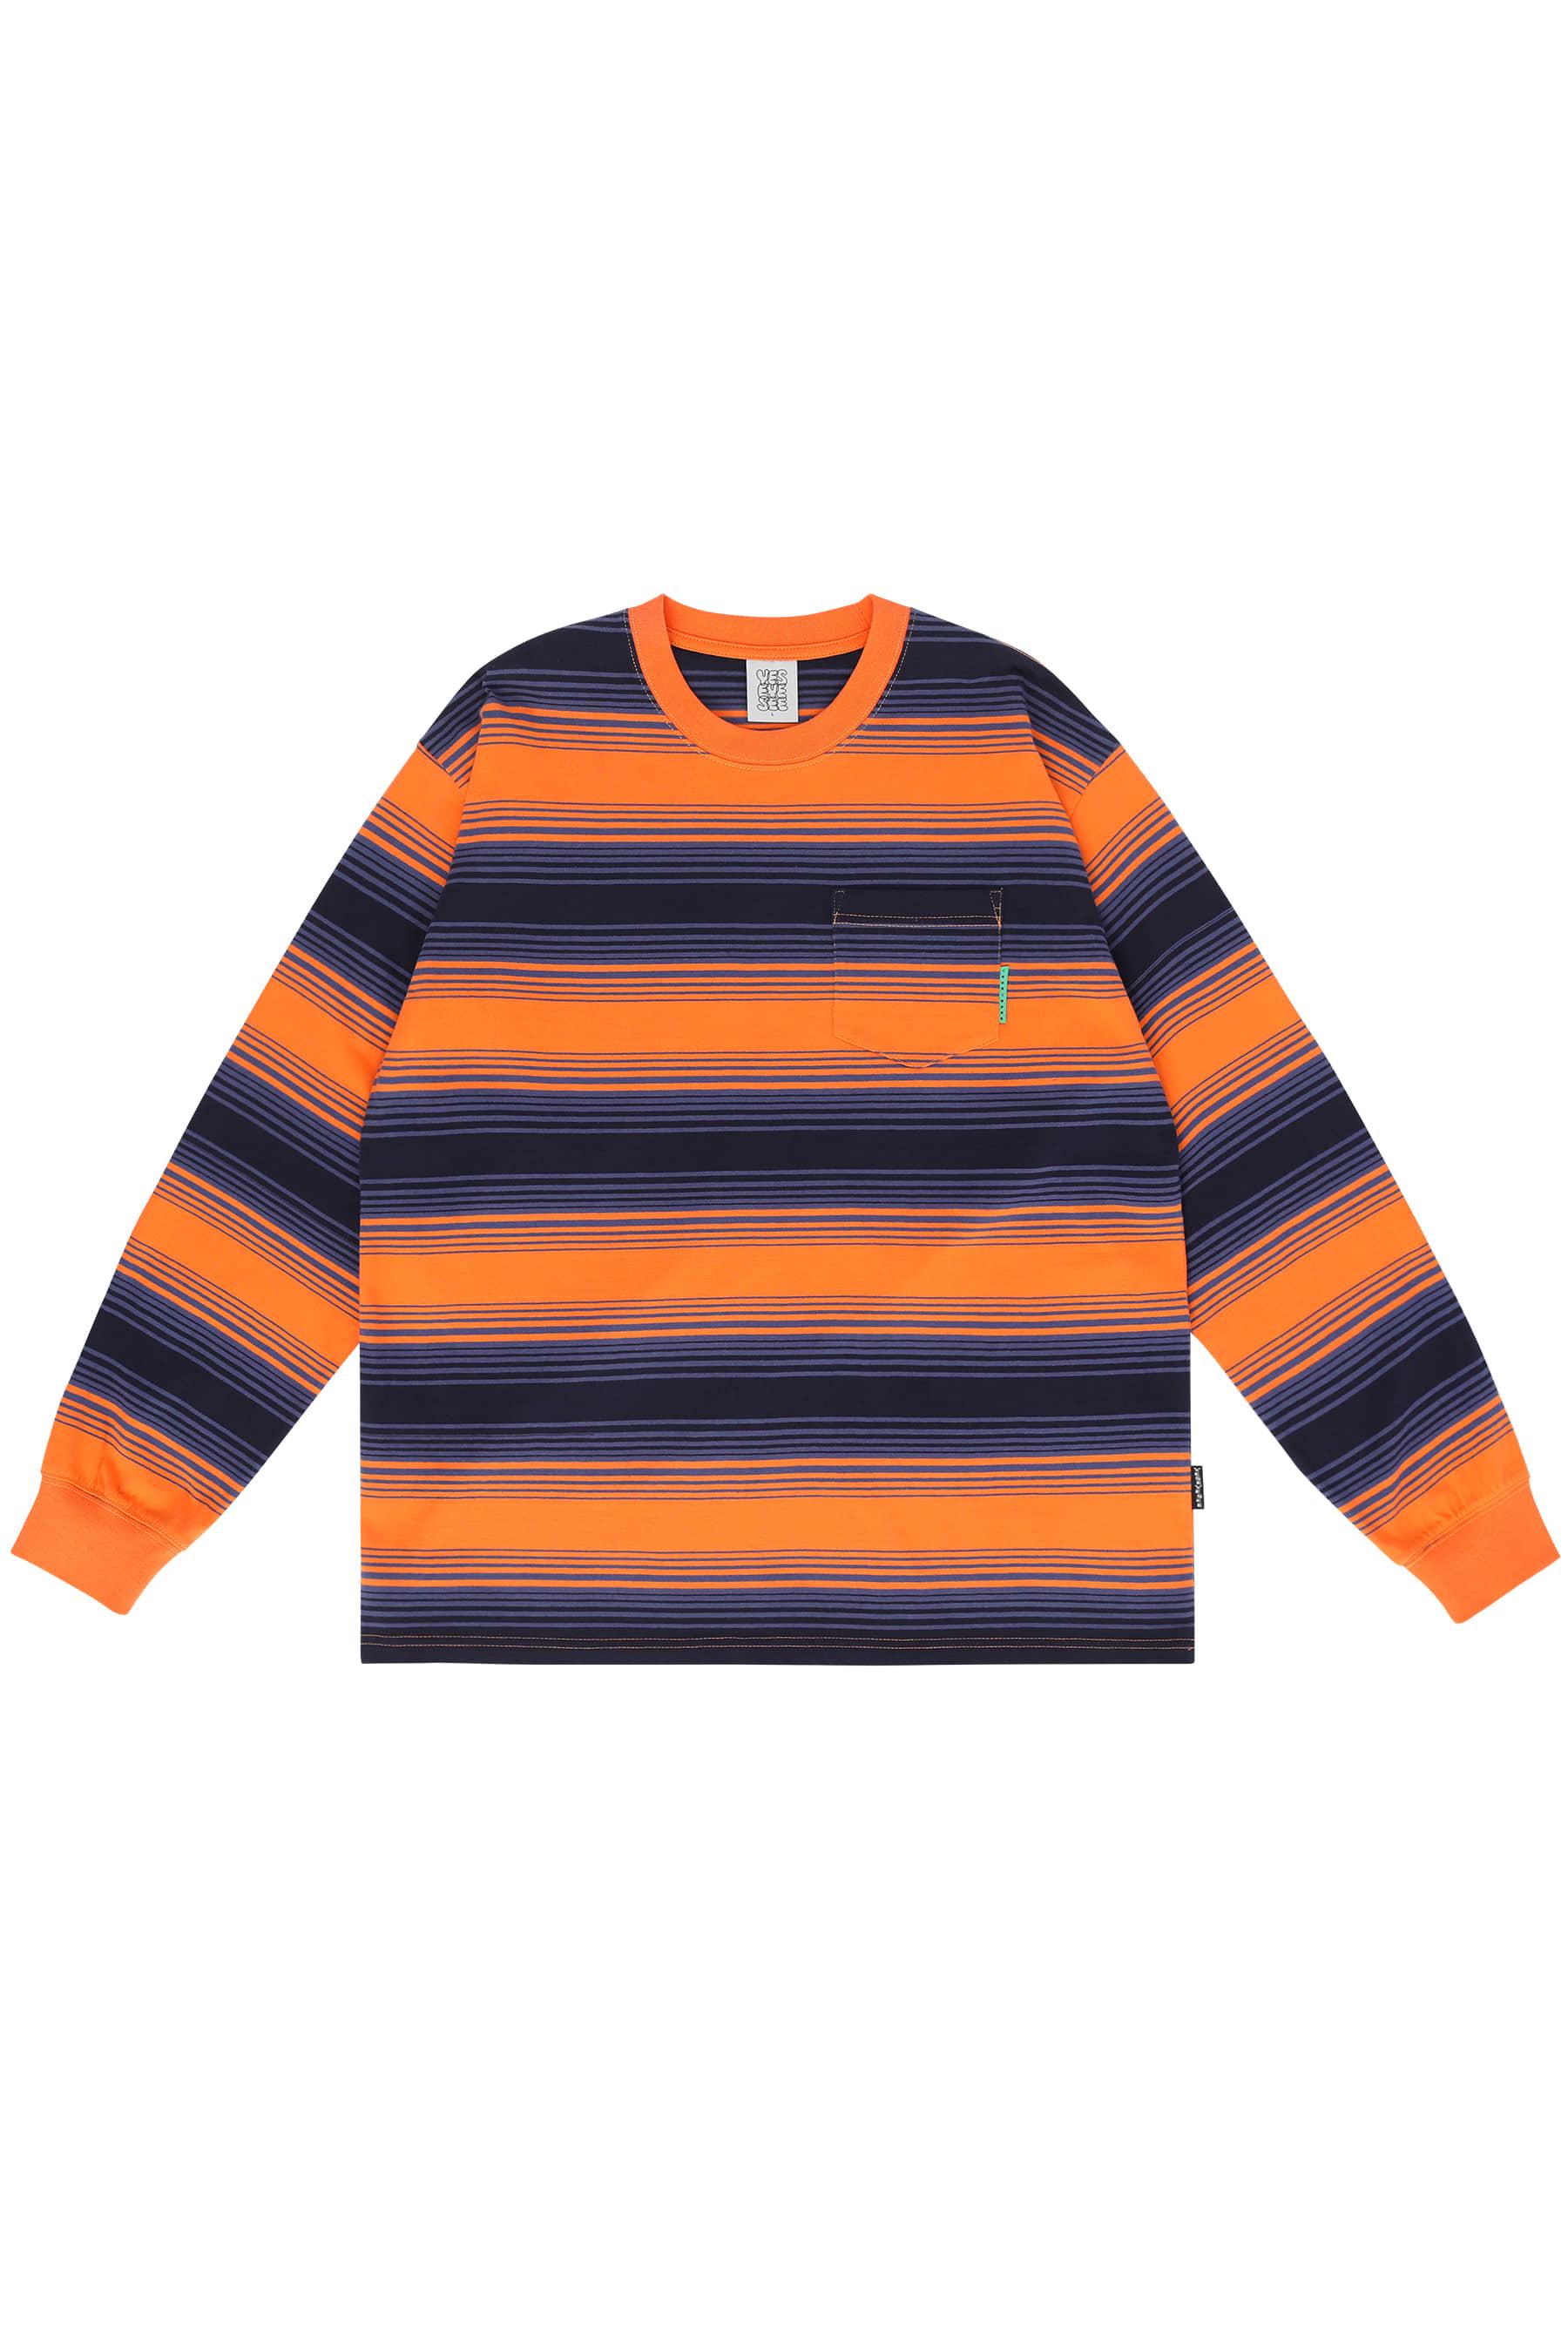 Y.E.S Stripe L/S Orange